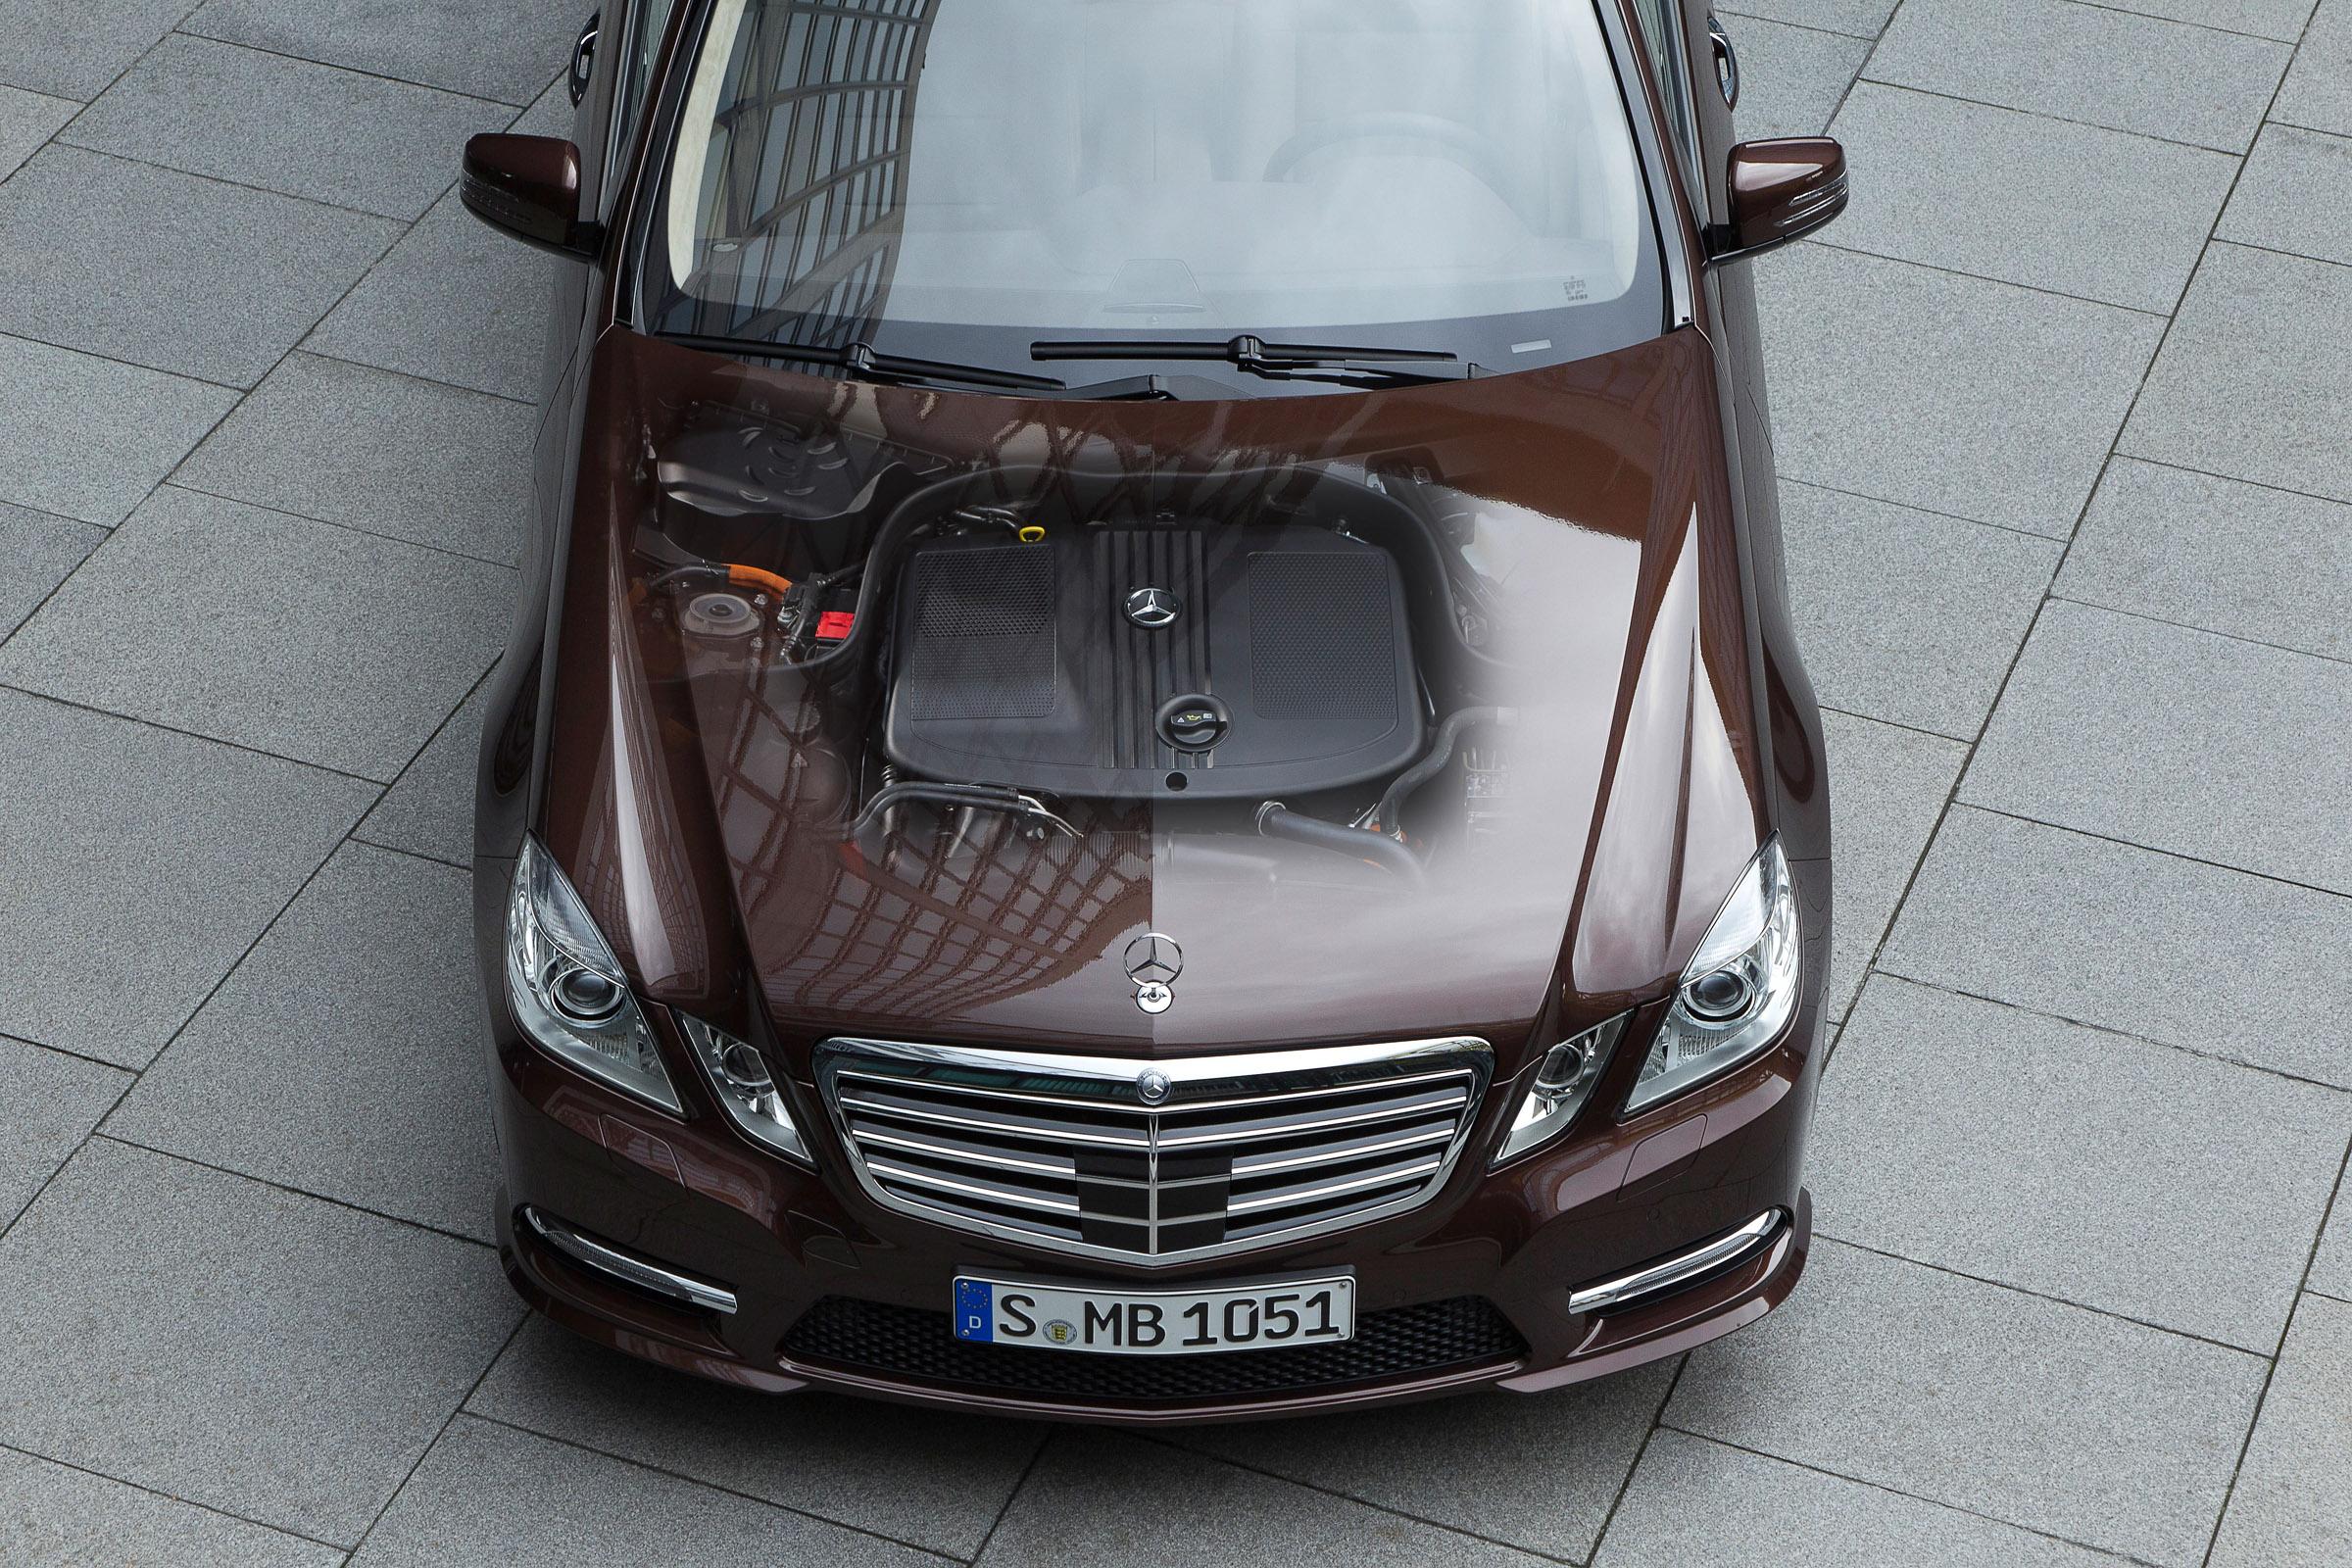 2012 Mercedes-Benz E 300 BlueTEC HYBRID - Picture 62391